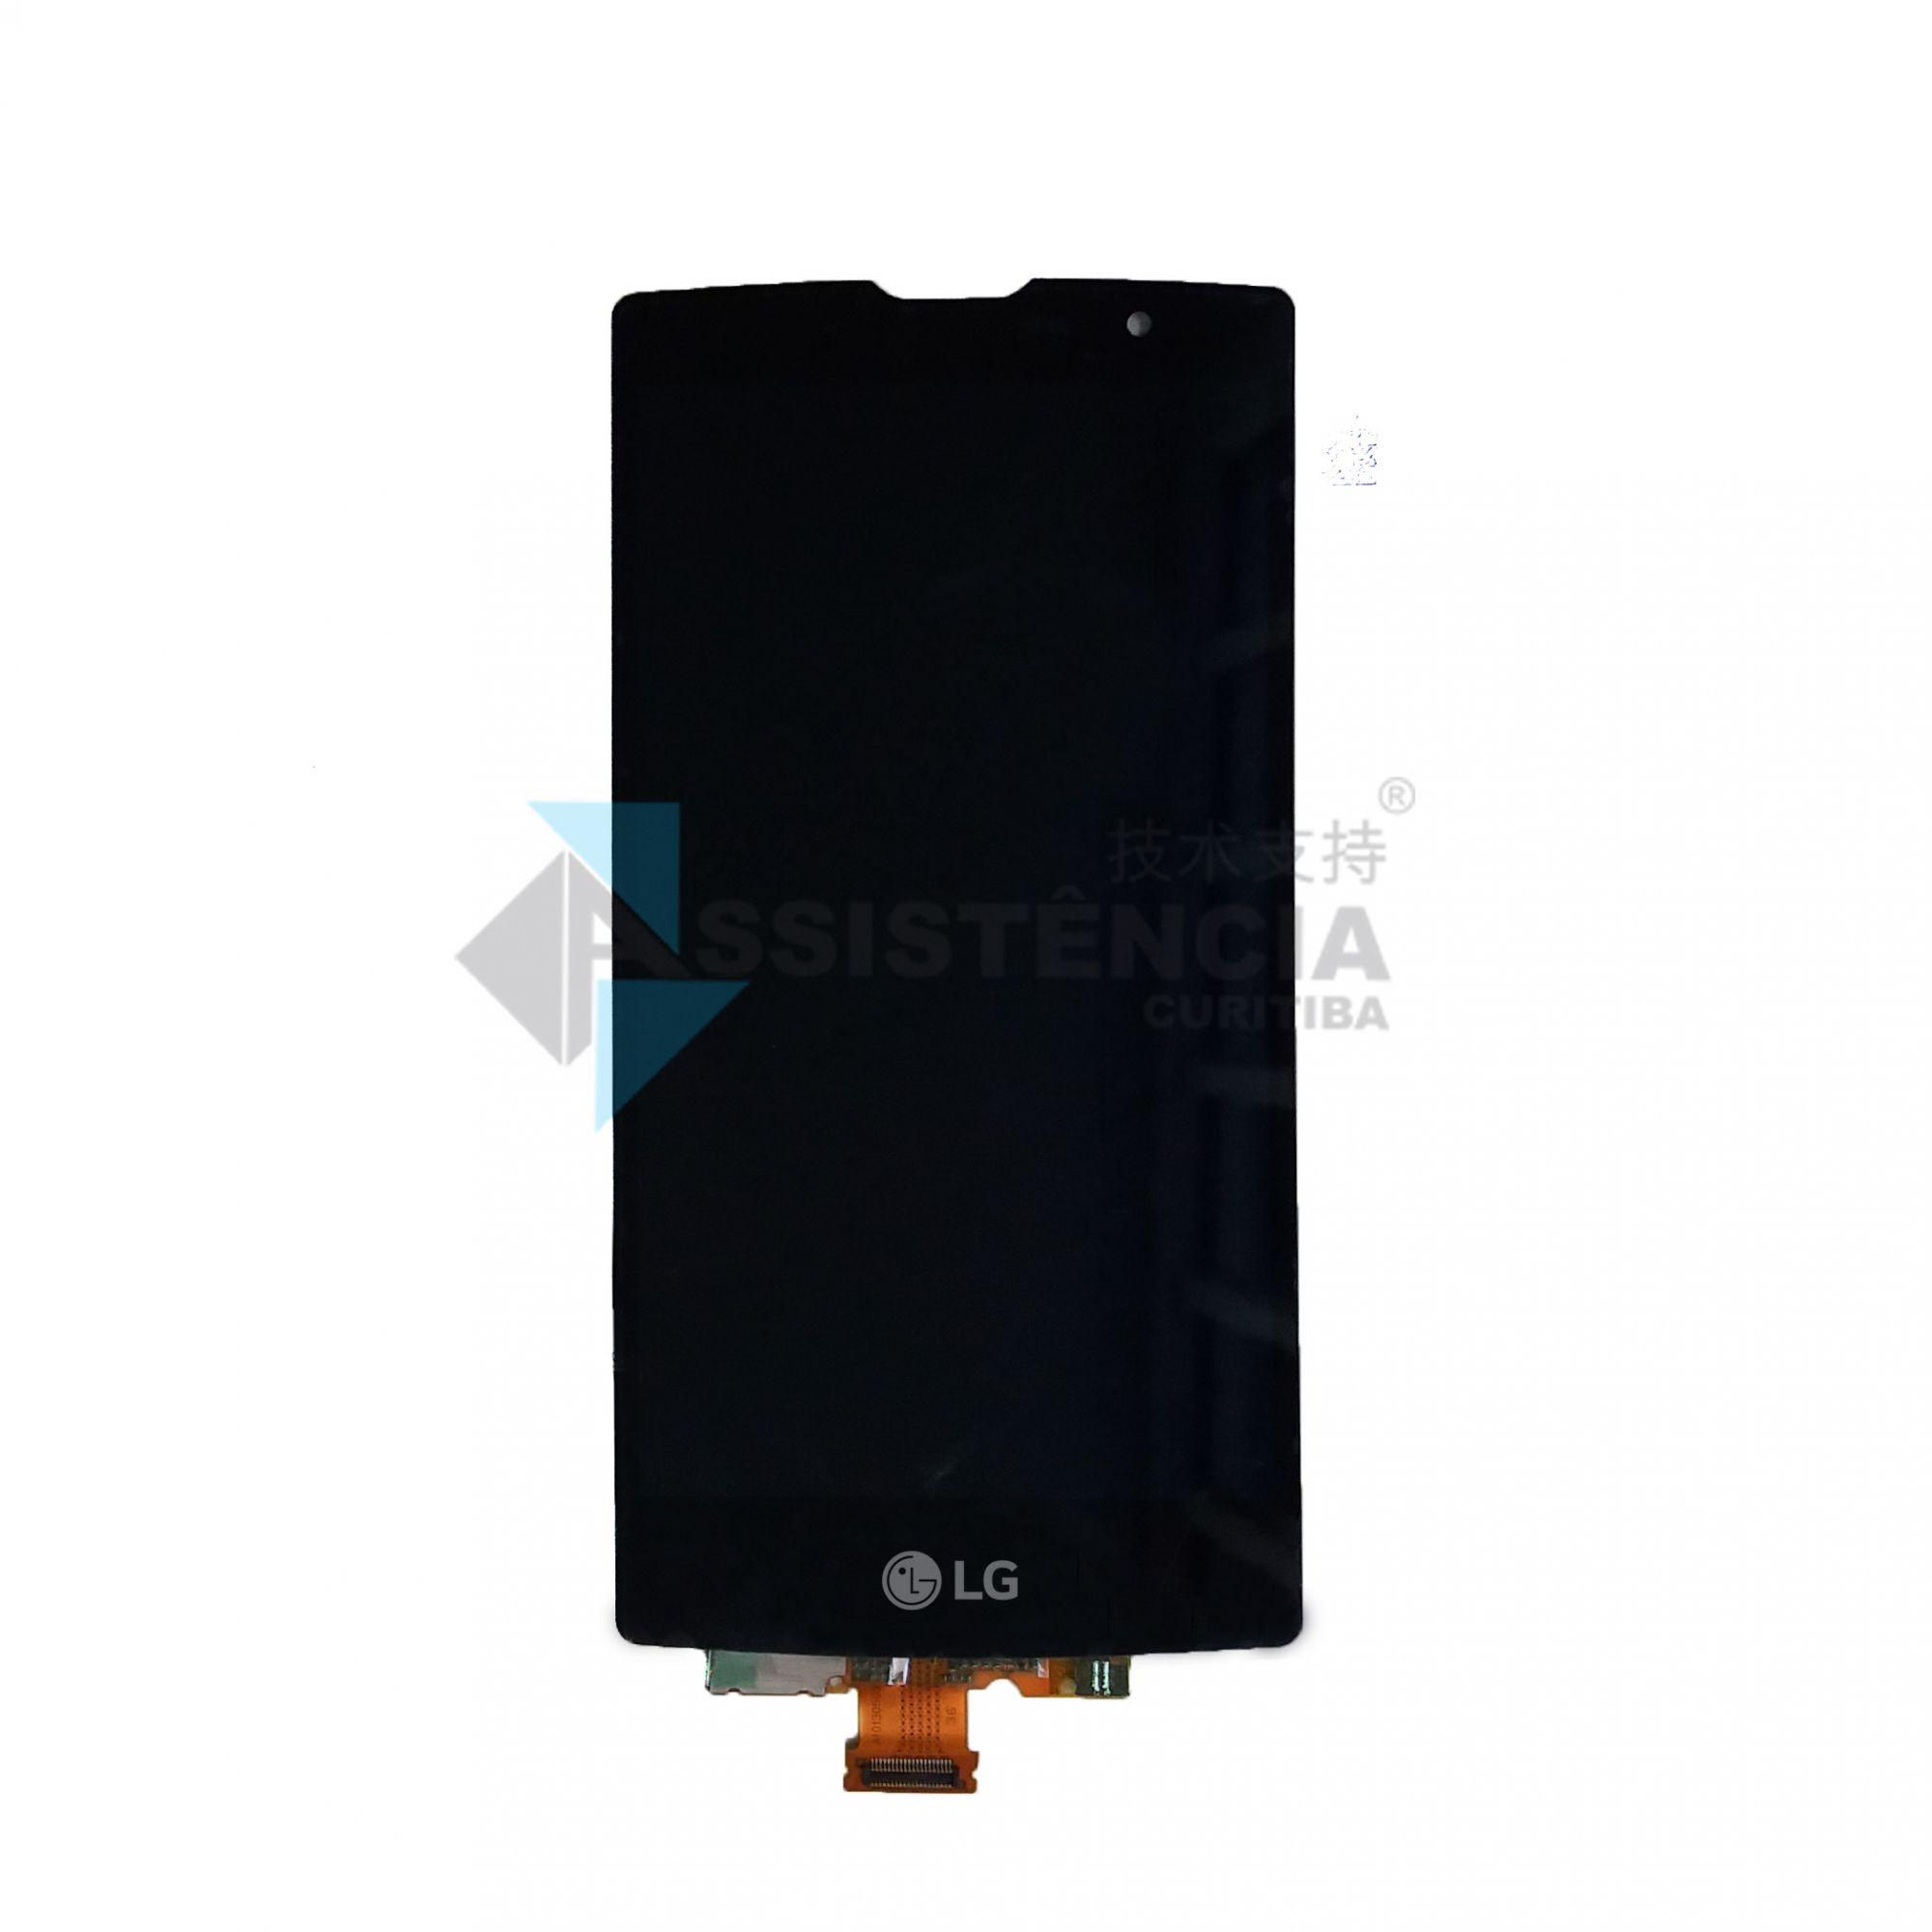 Tela Display Lg Volt Tv H422 H422Tv H422F